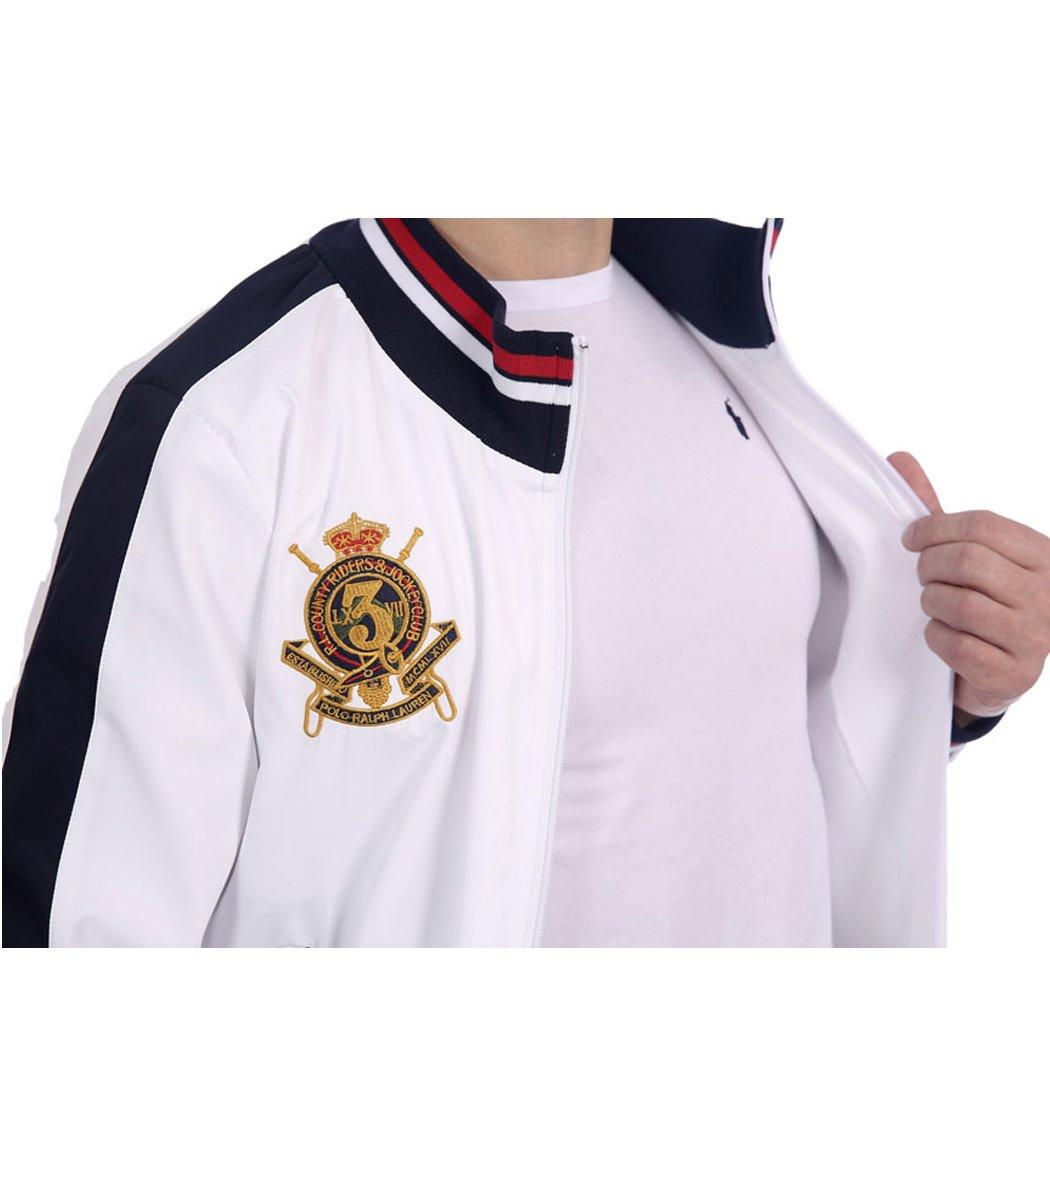 Спортивный костюм POLO Ralph Lauren Classic Белый/темно-синий - Белый - Вид 3